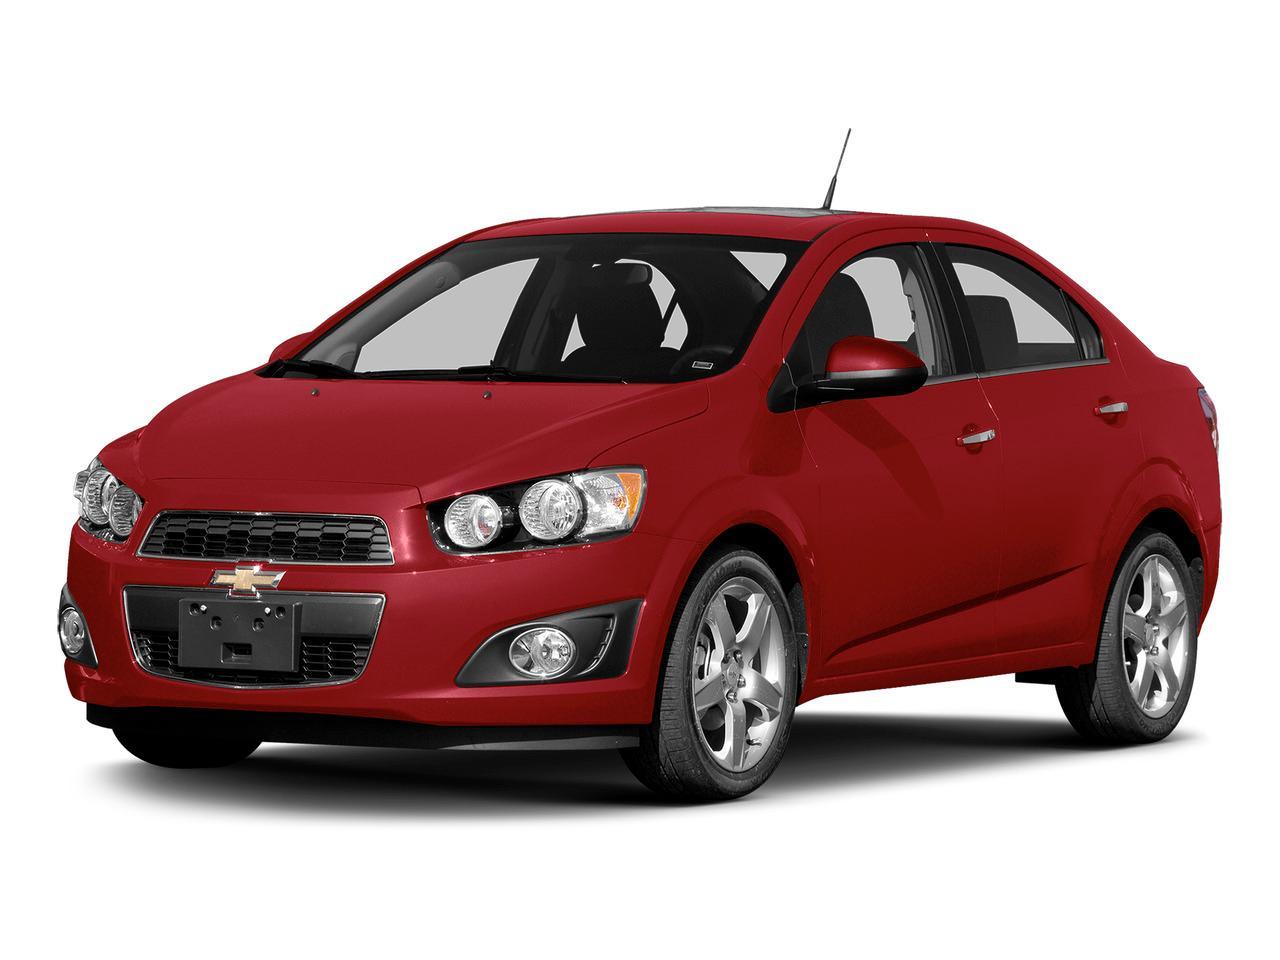 2015 Chevrolet Sonic Vehicle Photo in Ocala, FL 34474